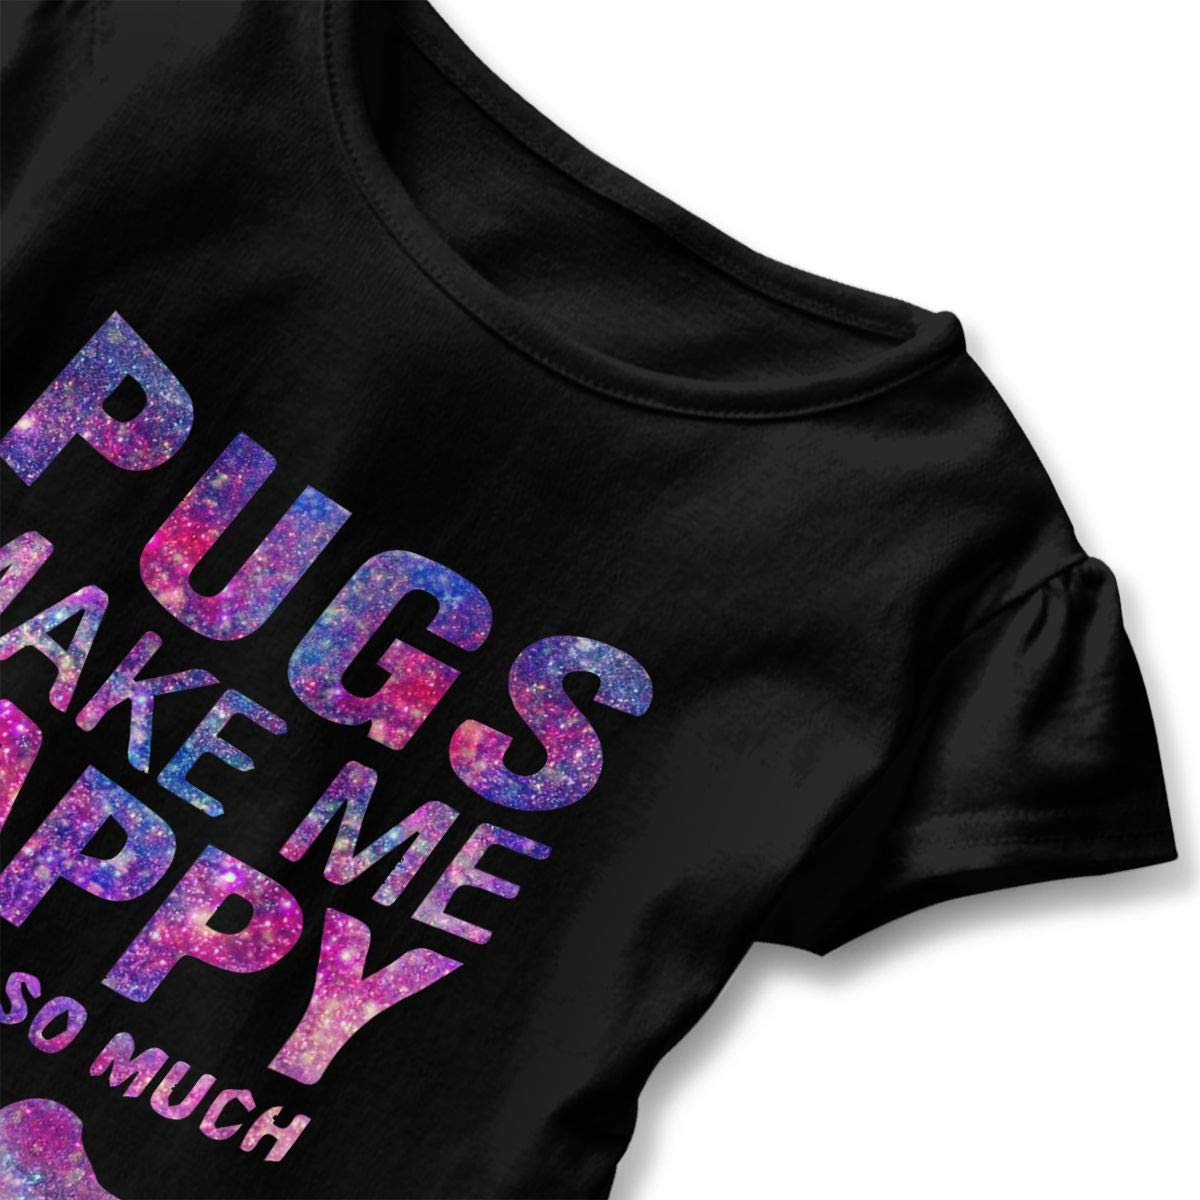 CZnuen Pugs Make Me Happy Baby Girls Round Neck Short Sleeve Ruffle T-Shirt Top